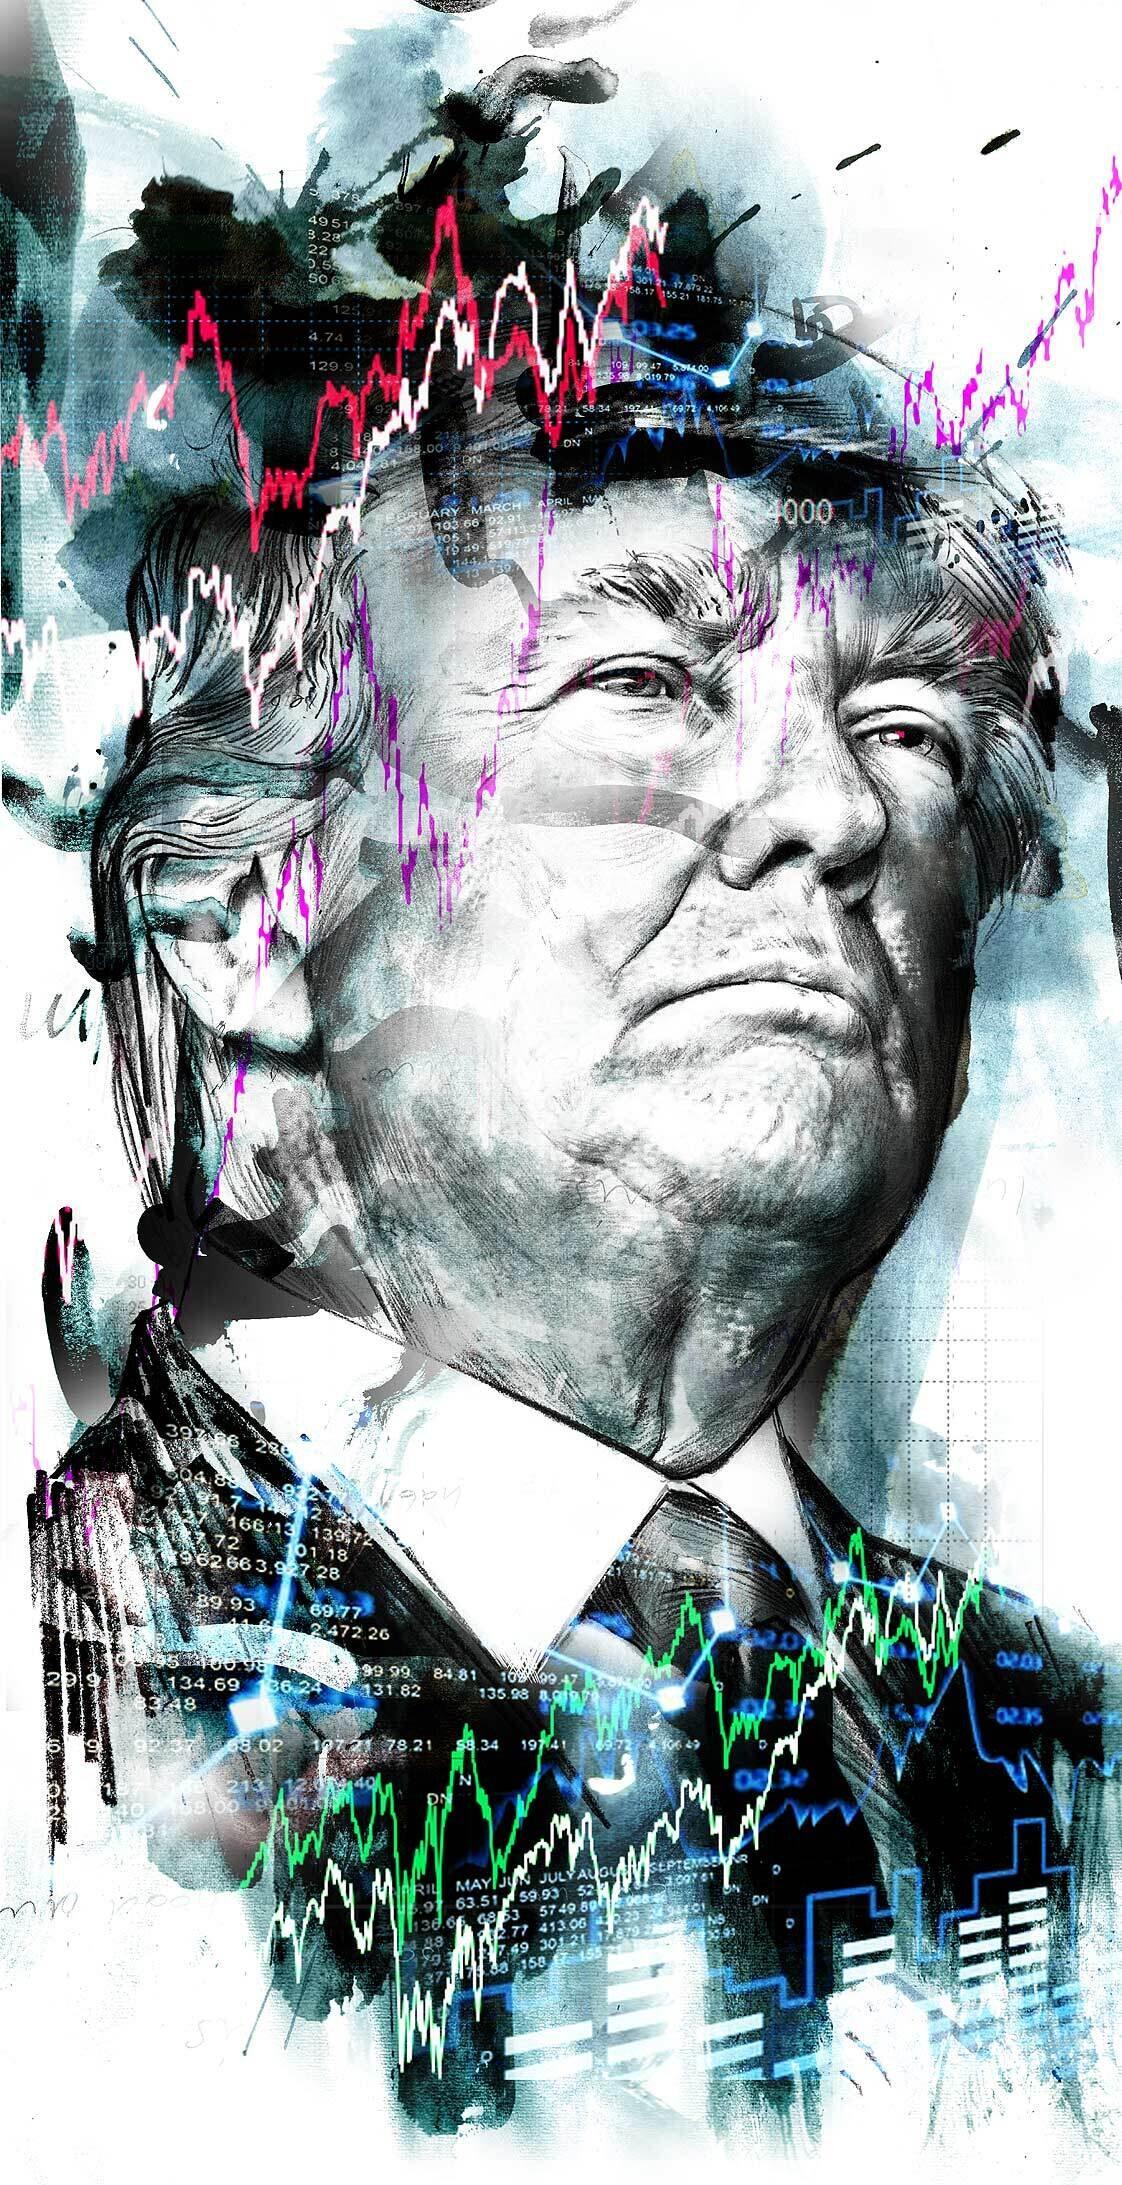 Donald Trump stock exchange charge - Kornel Illustration | Kornel Stadler portfolio